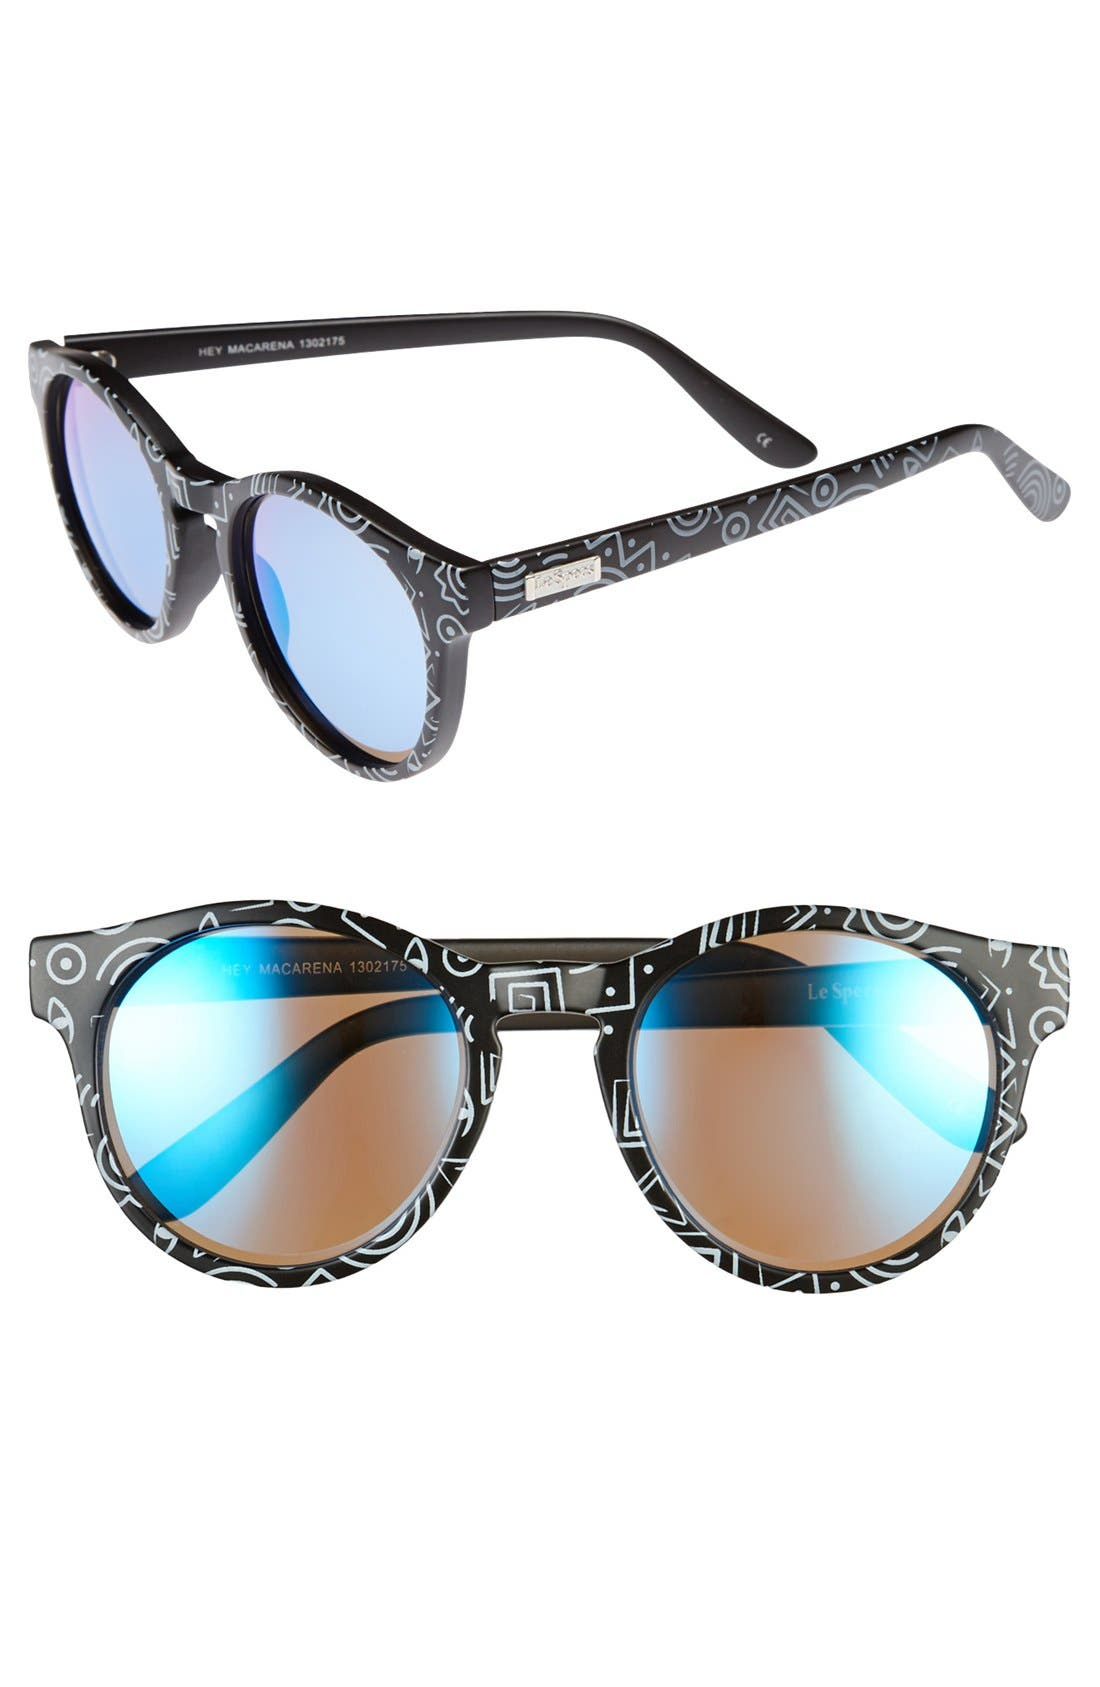 Alternate Image 1 Selected - Le Specs Retro 51mm Sunglasses